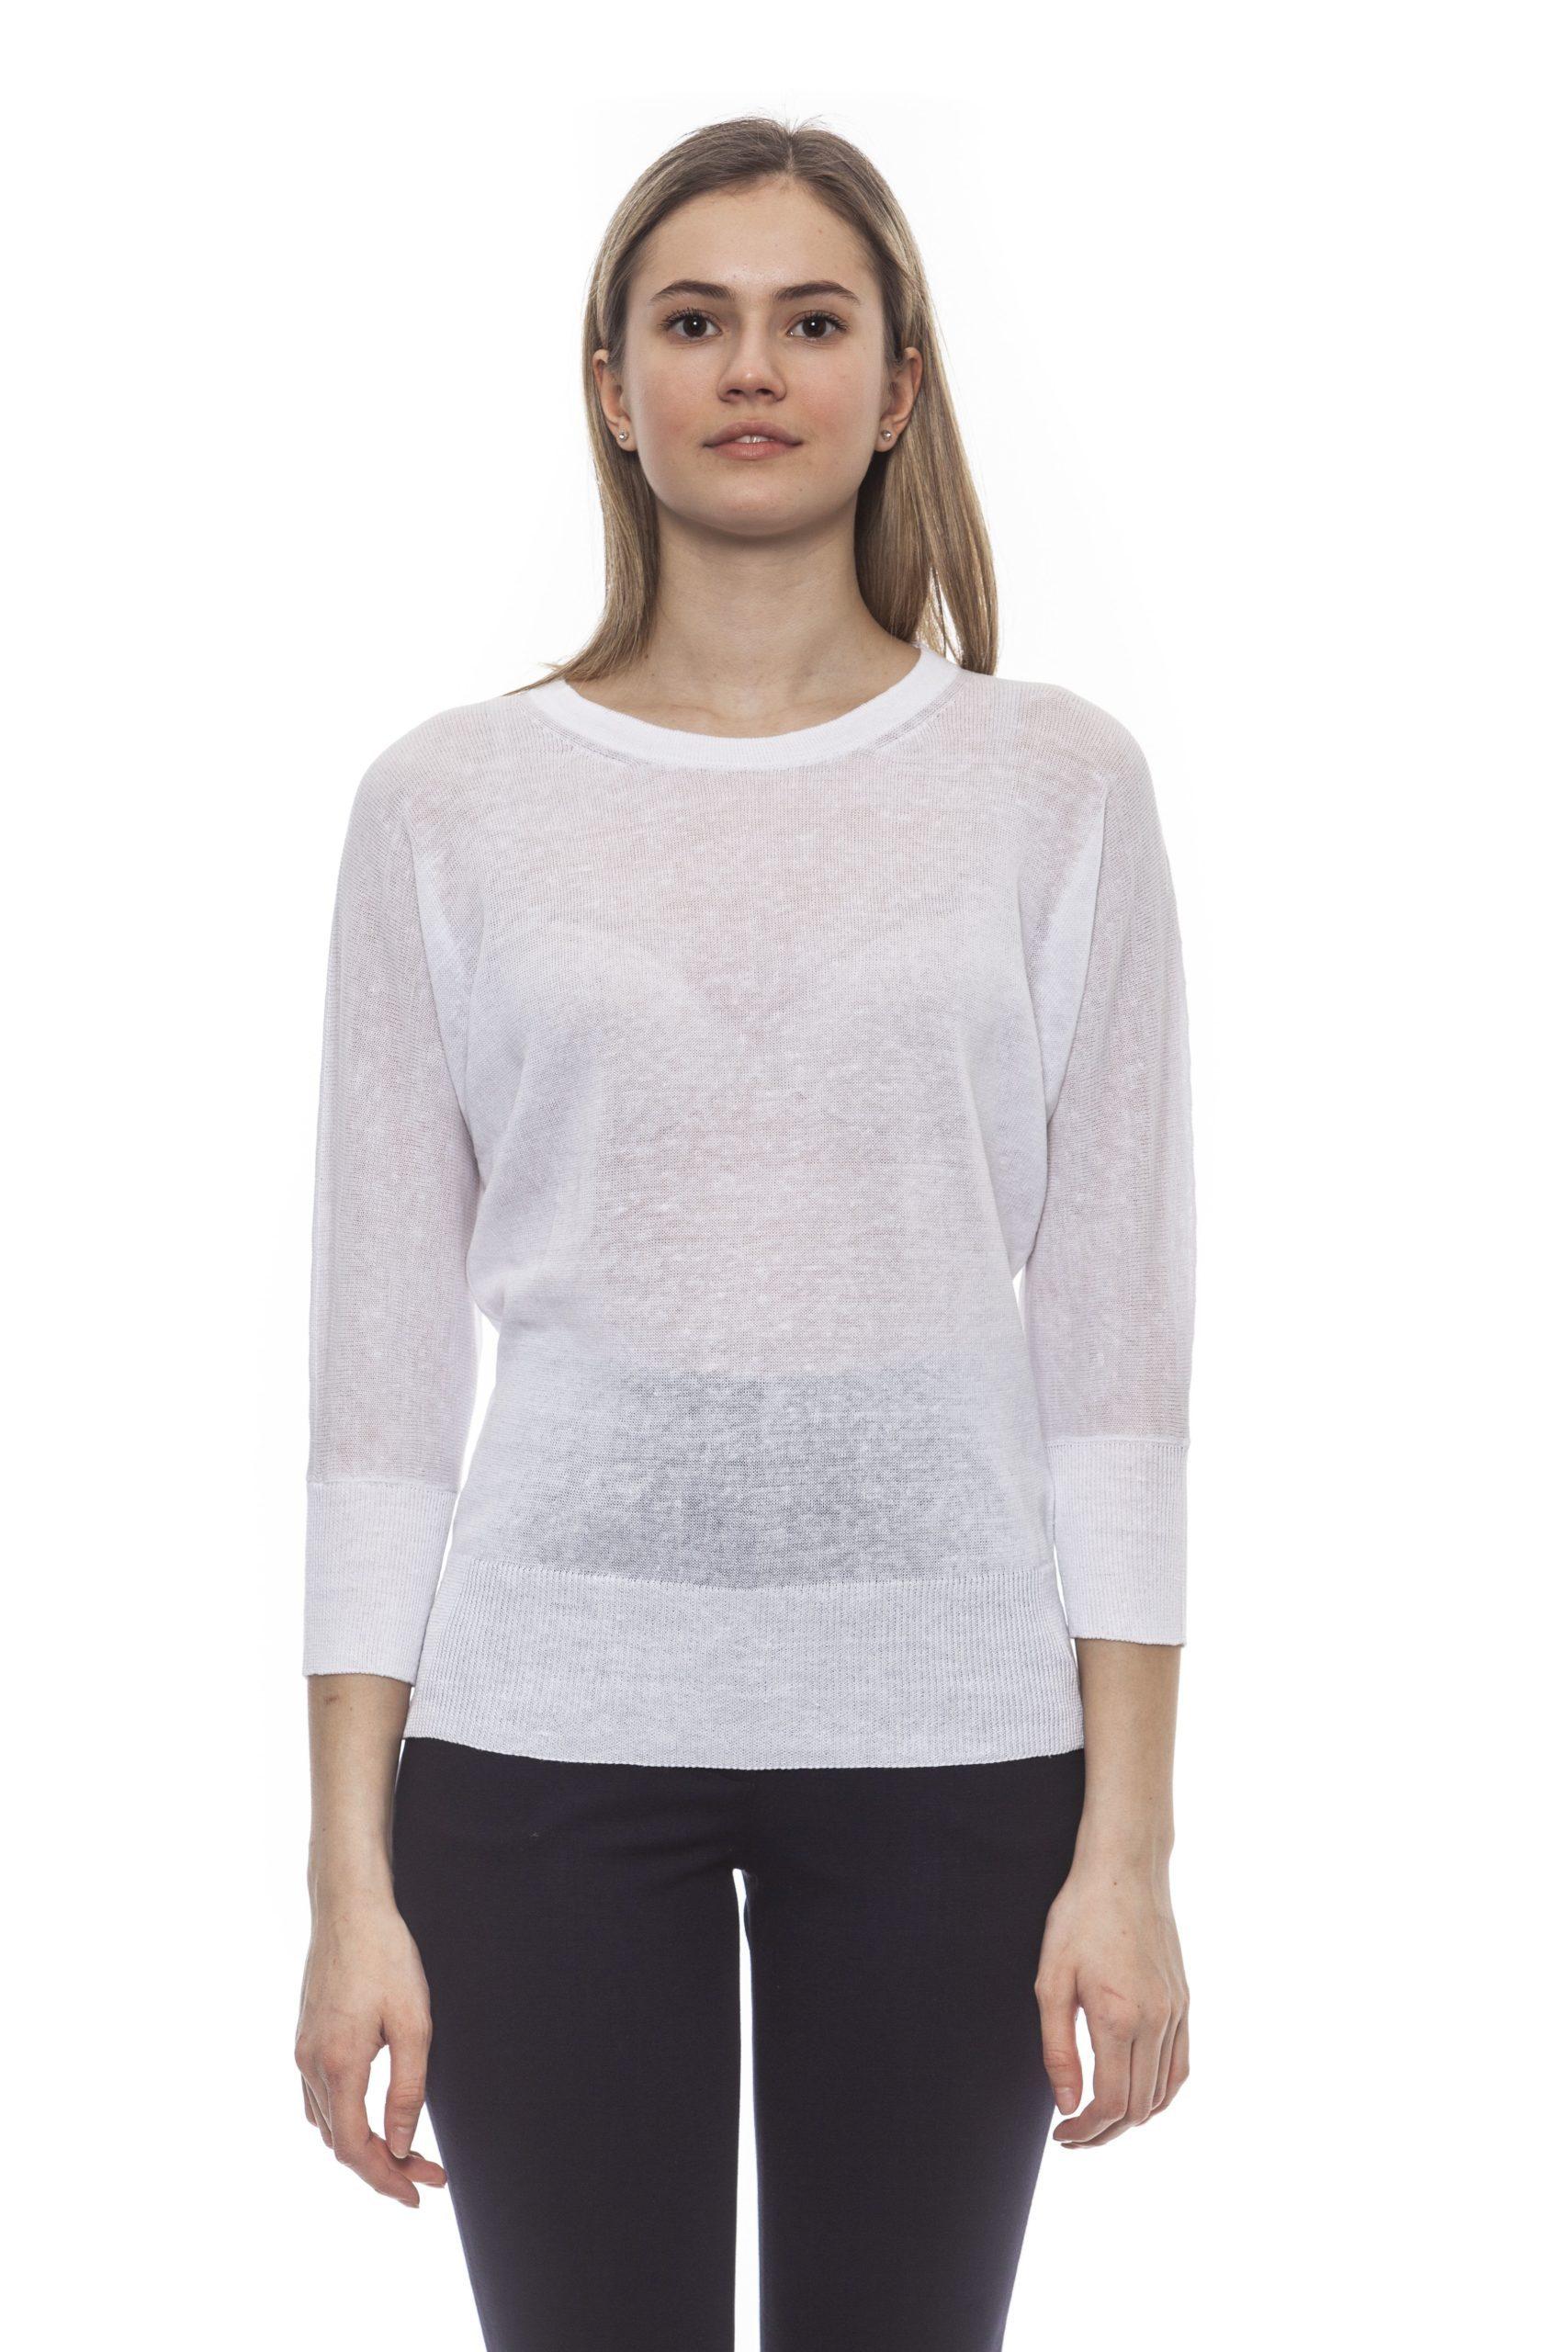 Peserico Women's Bianco Sweater White PE1382023 - IT42 | S